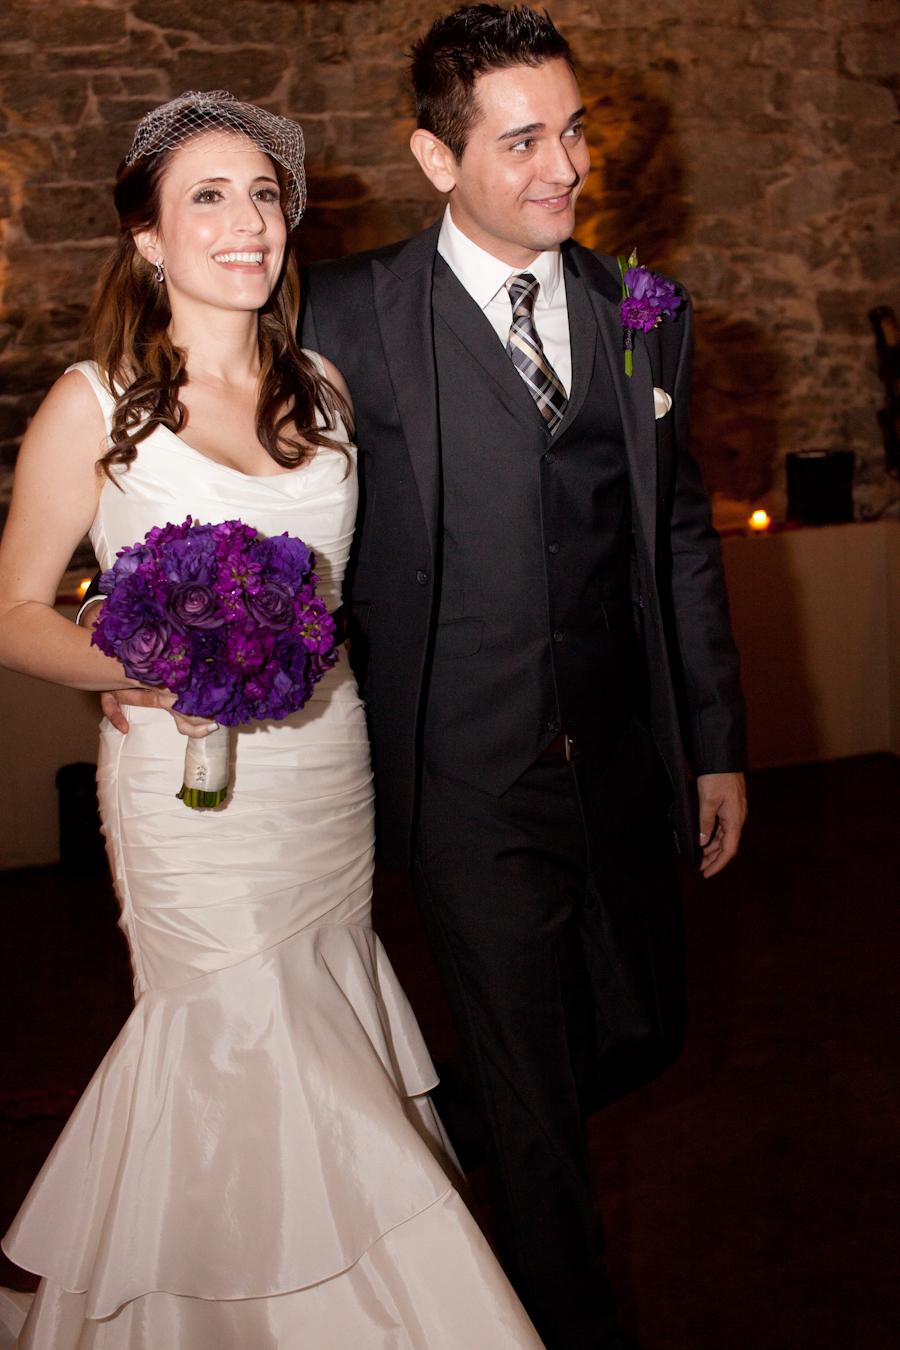 biltmore wedding asheville nc-5.jpg